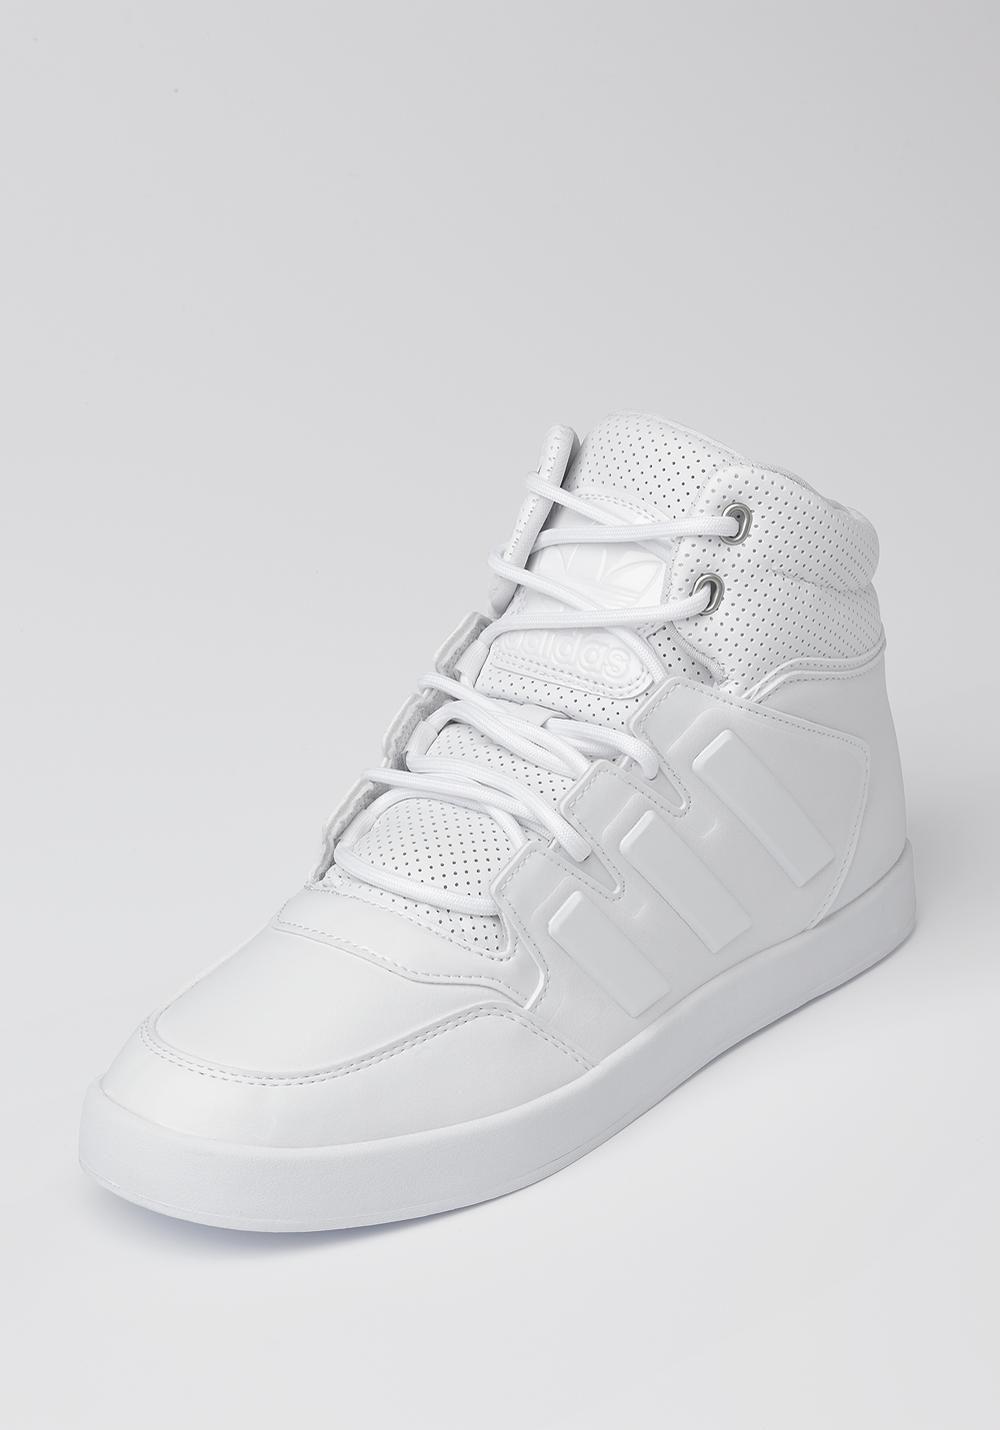 promo code b9b19 ad83d All white sneakers ADIDAS Dropstep Adidas  frontlineshop.com